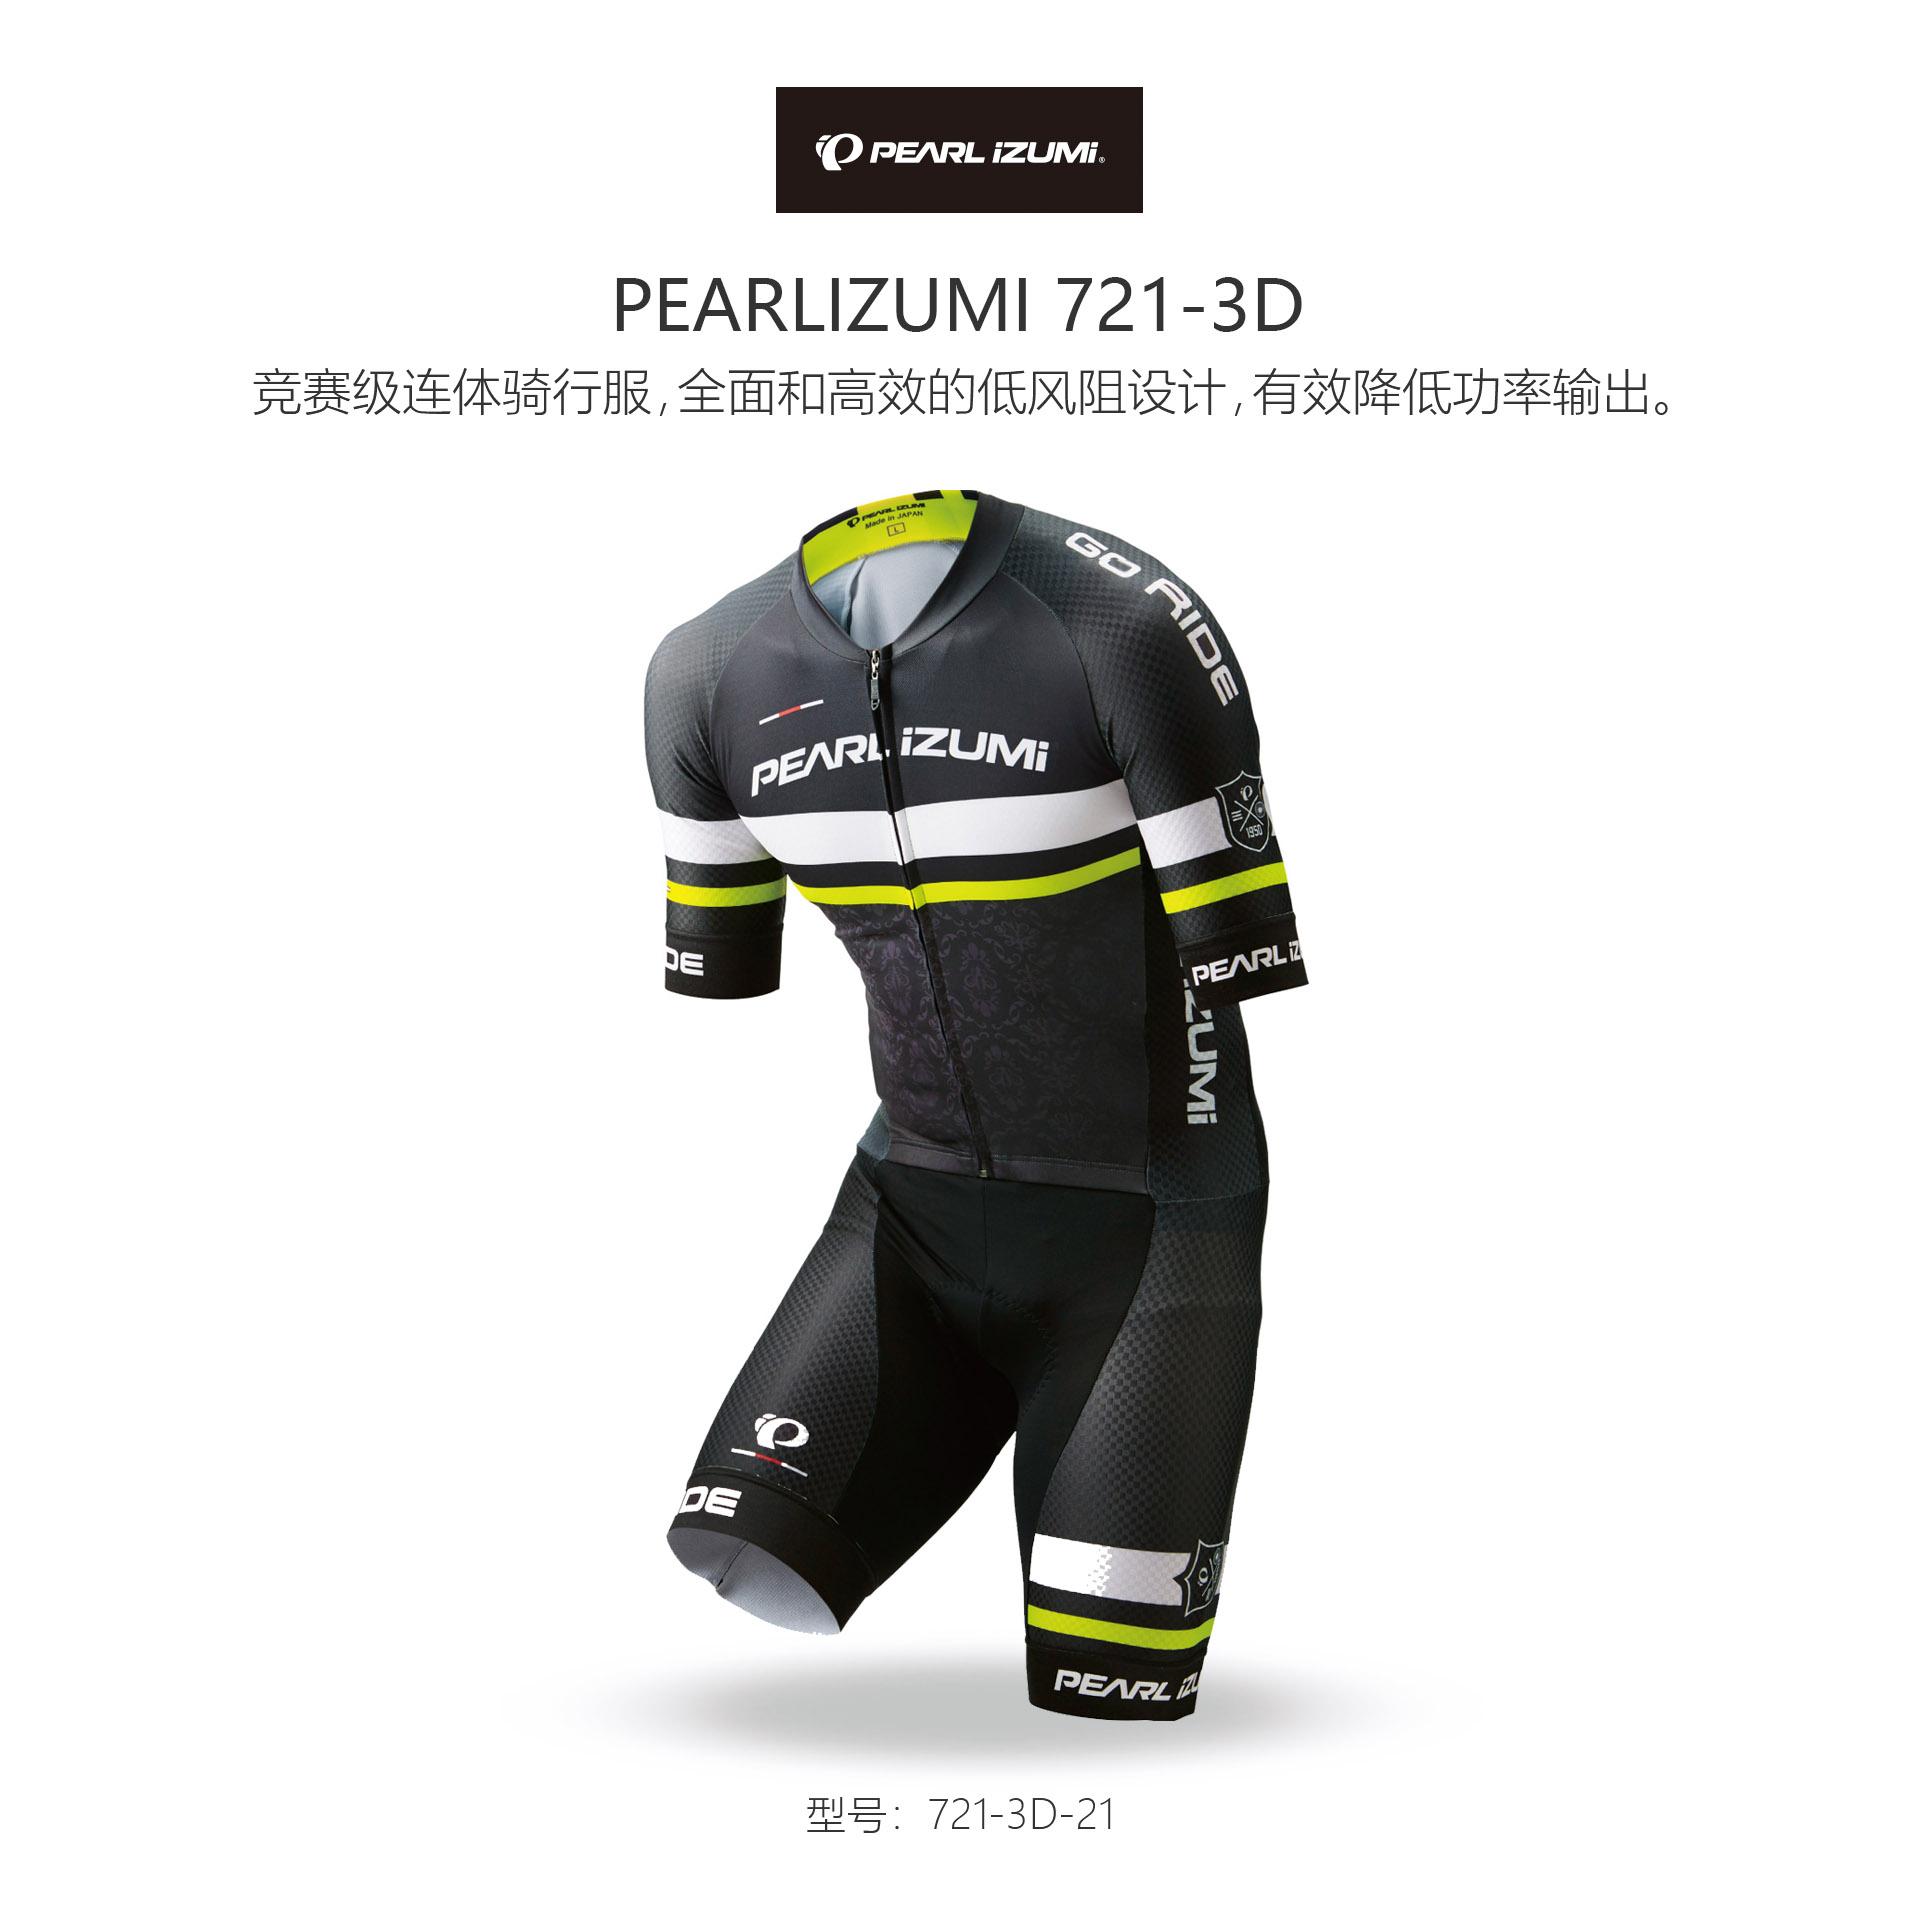 PEARL IZUMI 一字米 721-3D 夏季连体骑行服 断码